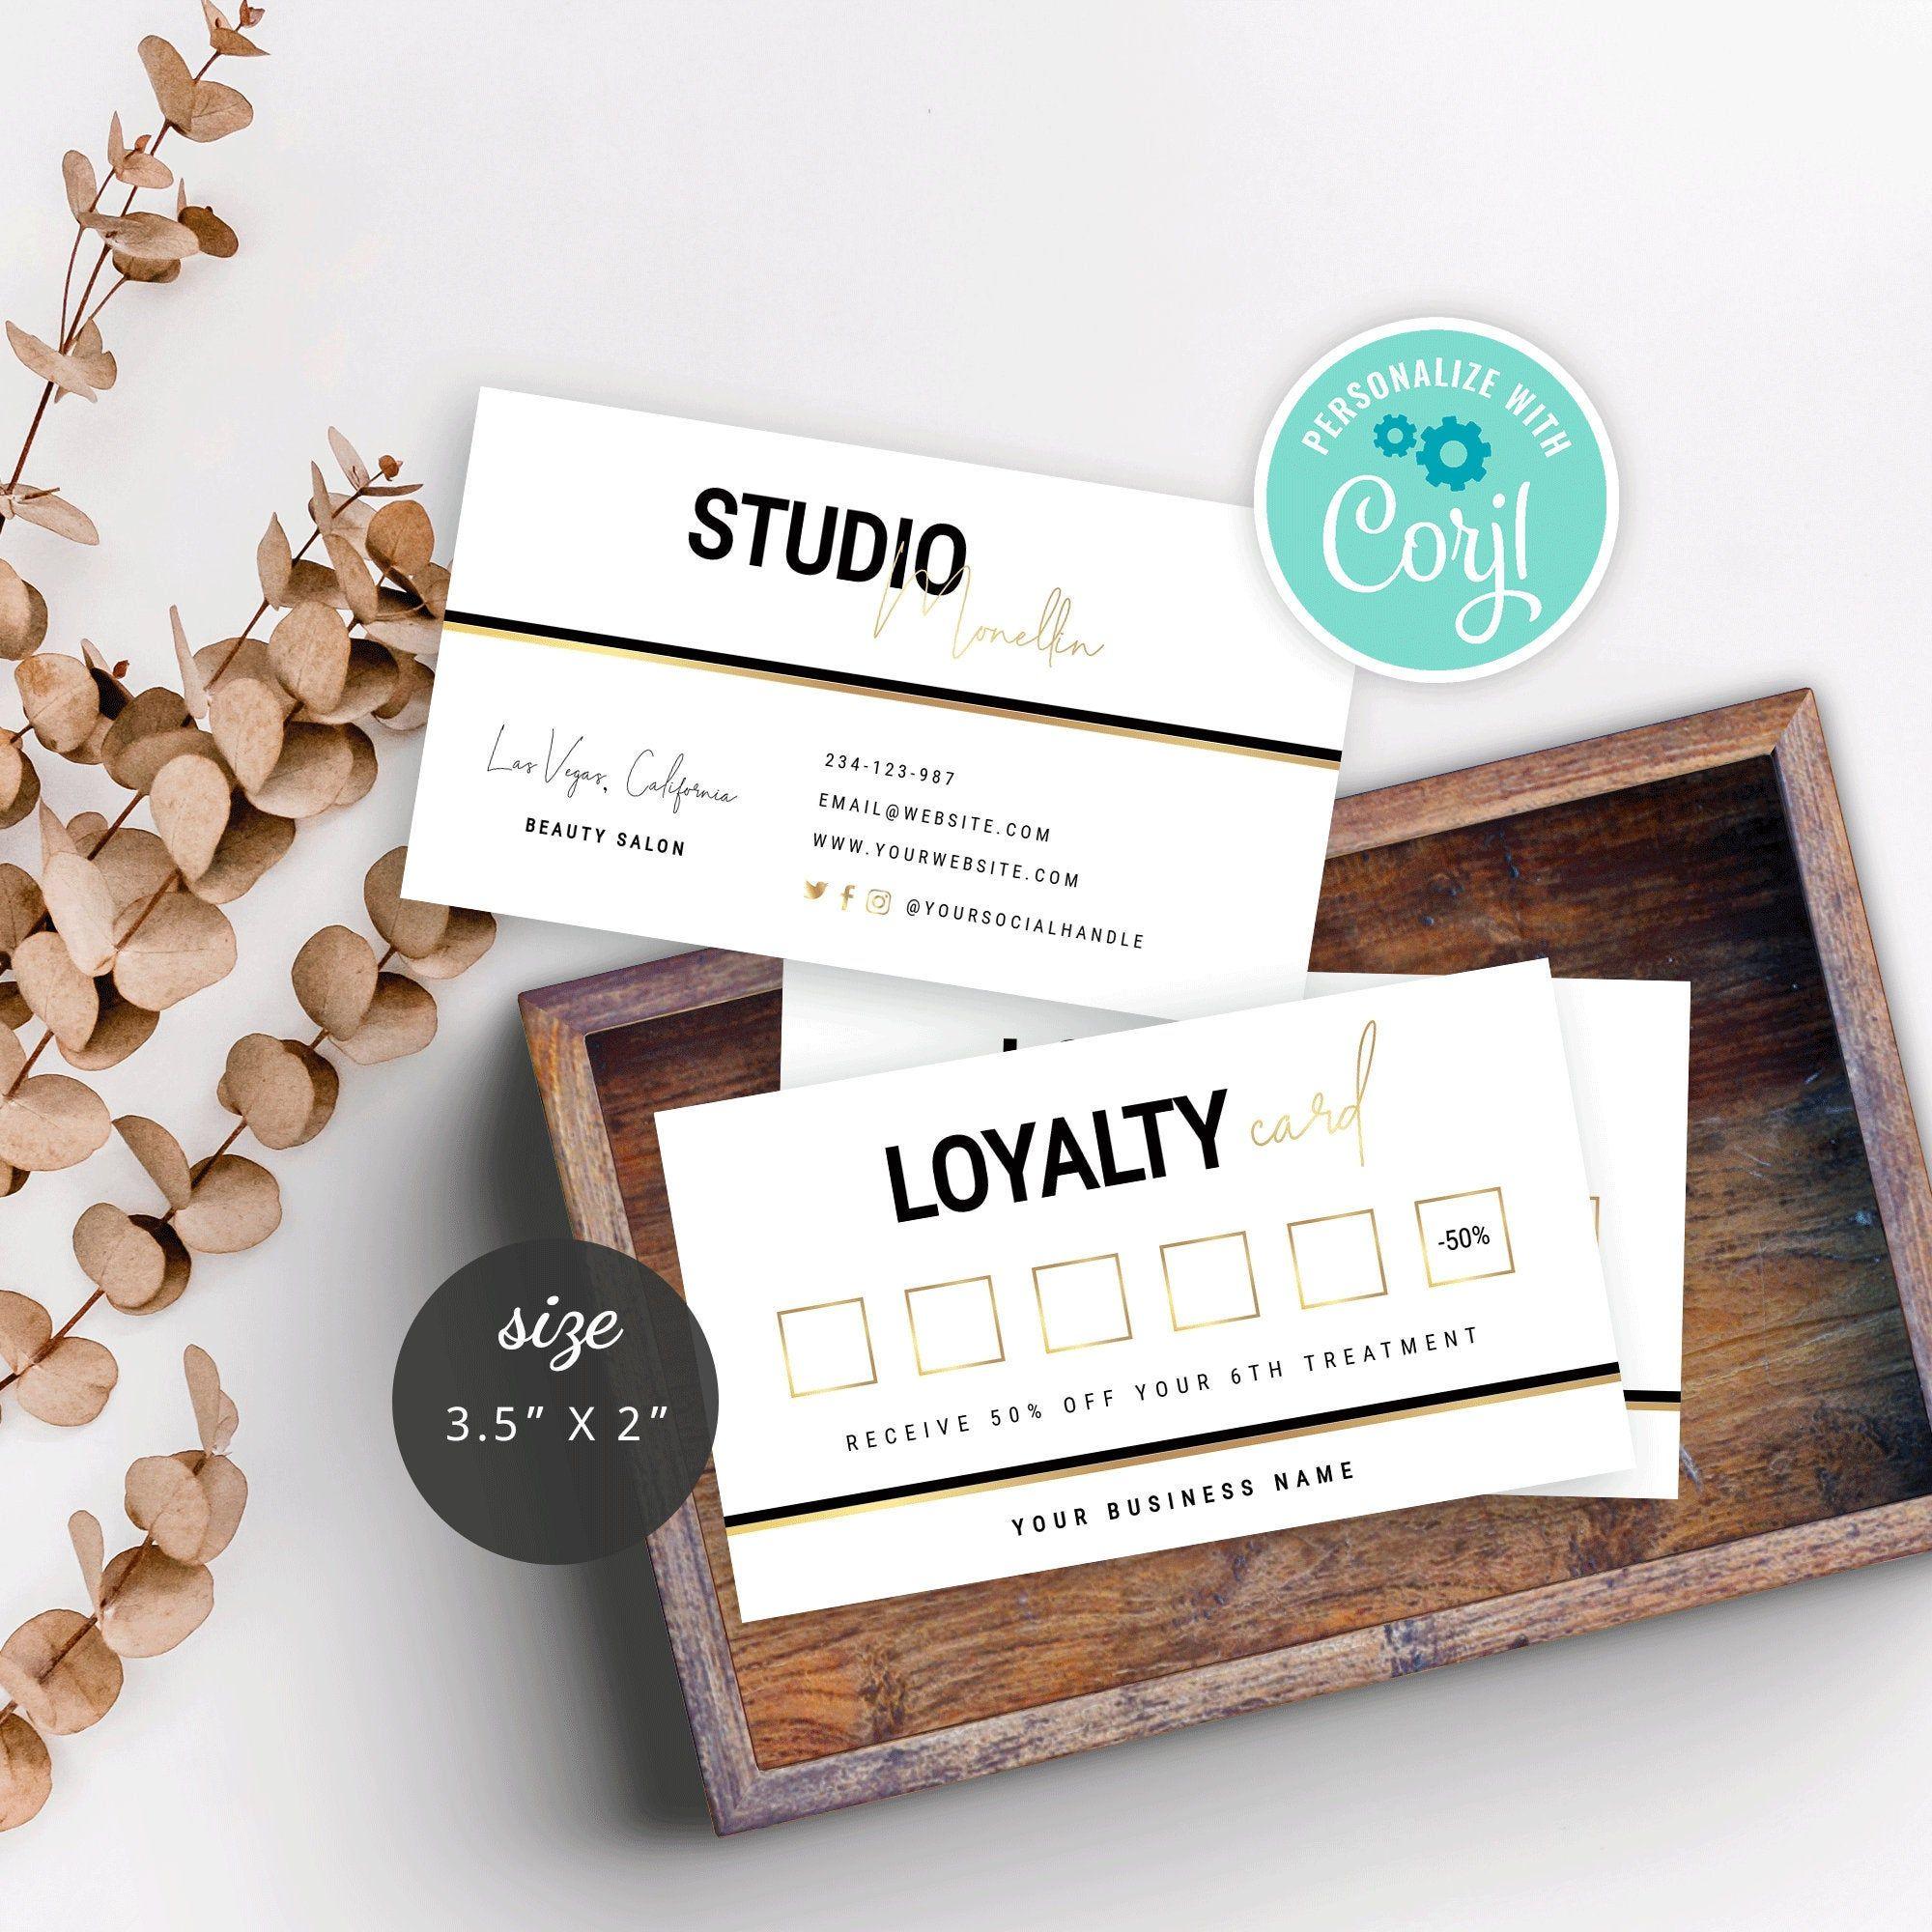 Diy Loyalty Card Editable Loyalty Cards Template Printable Etsy Loyalty Card Template Diy Loyalty Cards Card Templates Printable